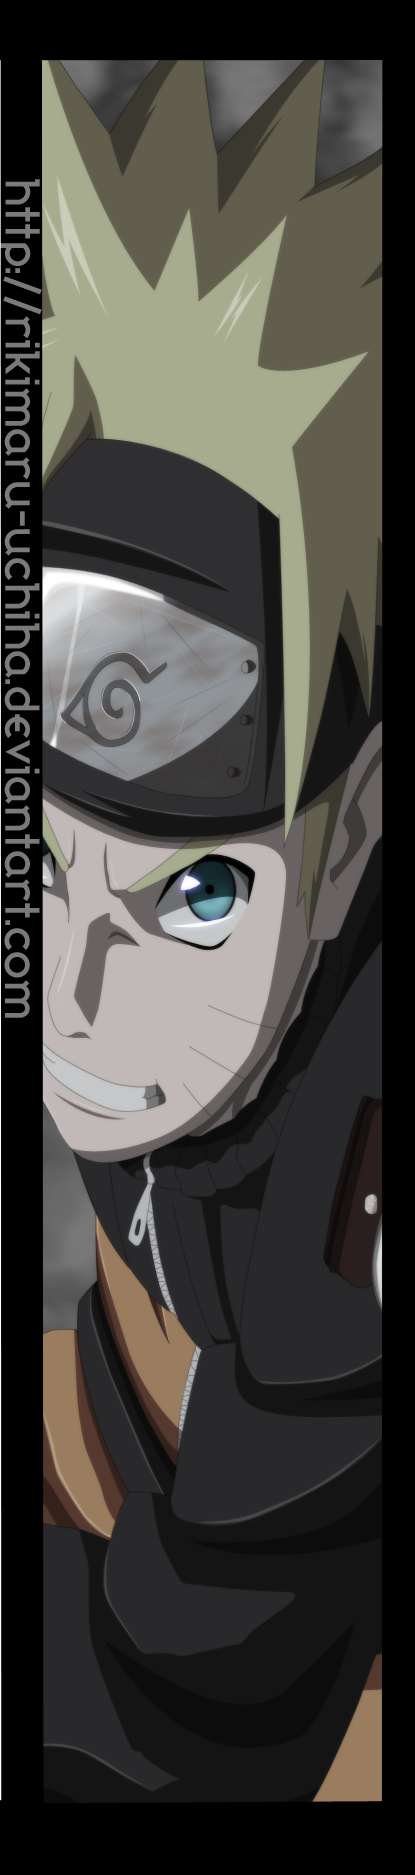 Naruto by Rikimaru-Uchiha